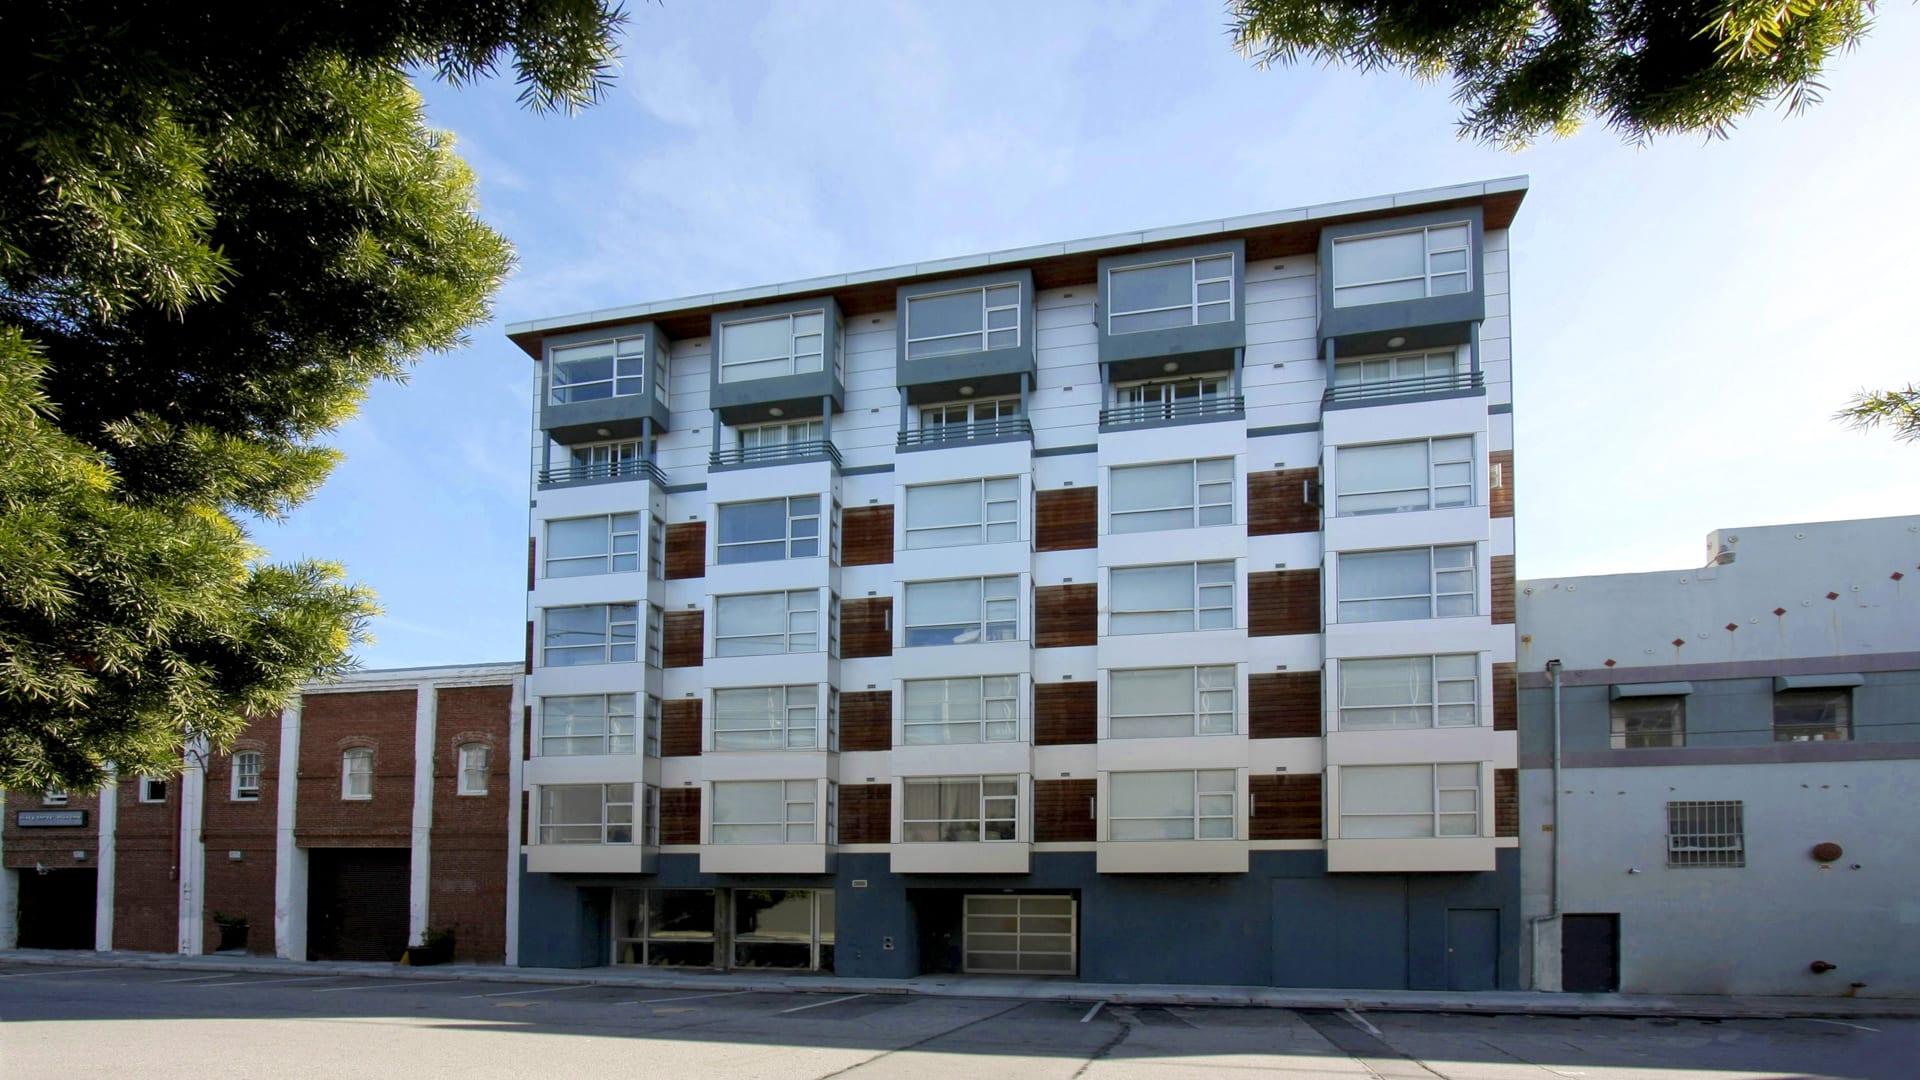 77 Bluxome Apartments - Building